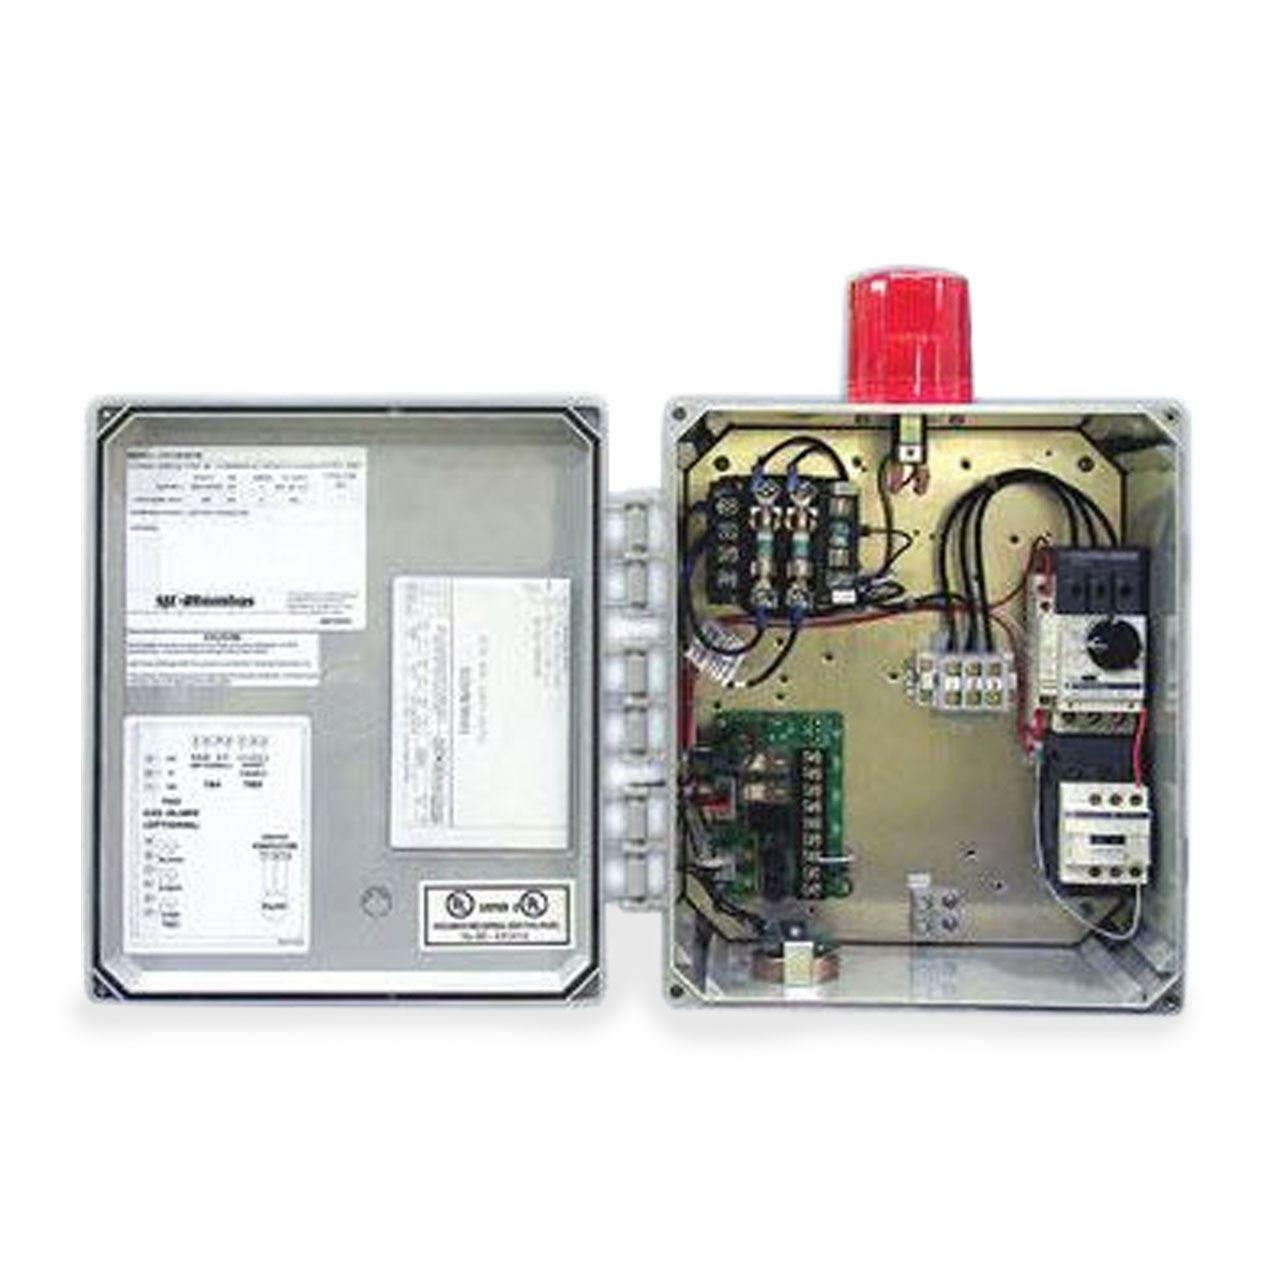 small resolution of sje rhombus sje rhombus model 312 3 phase 208 240 480 600v simplexduplex motor starter wiring